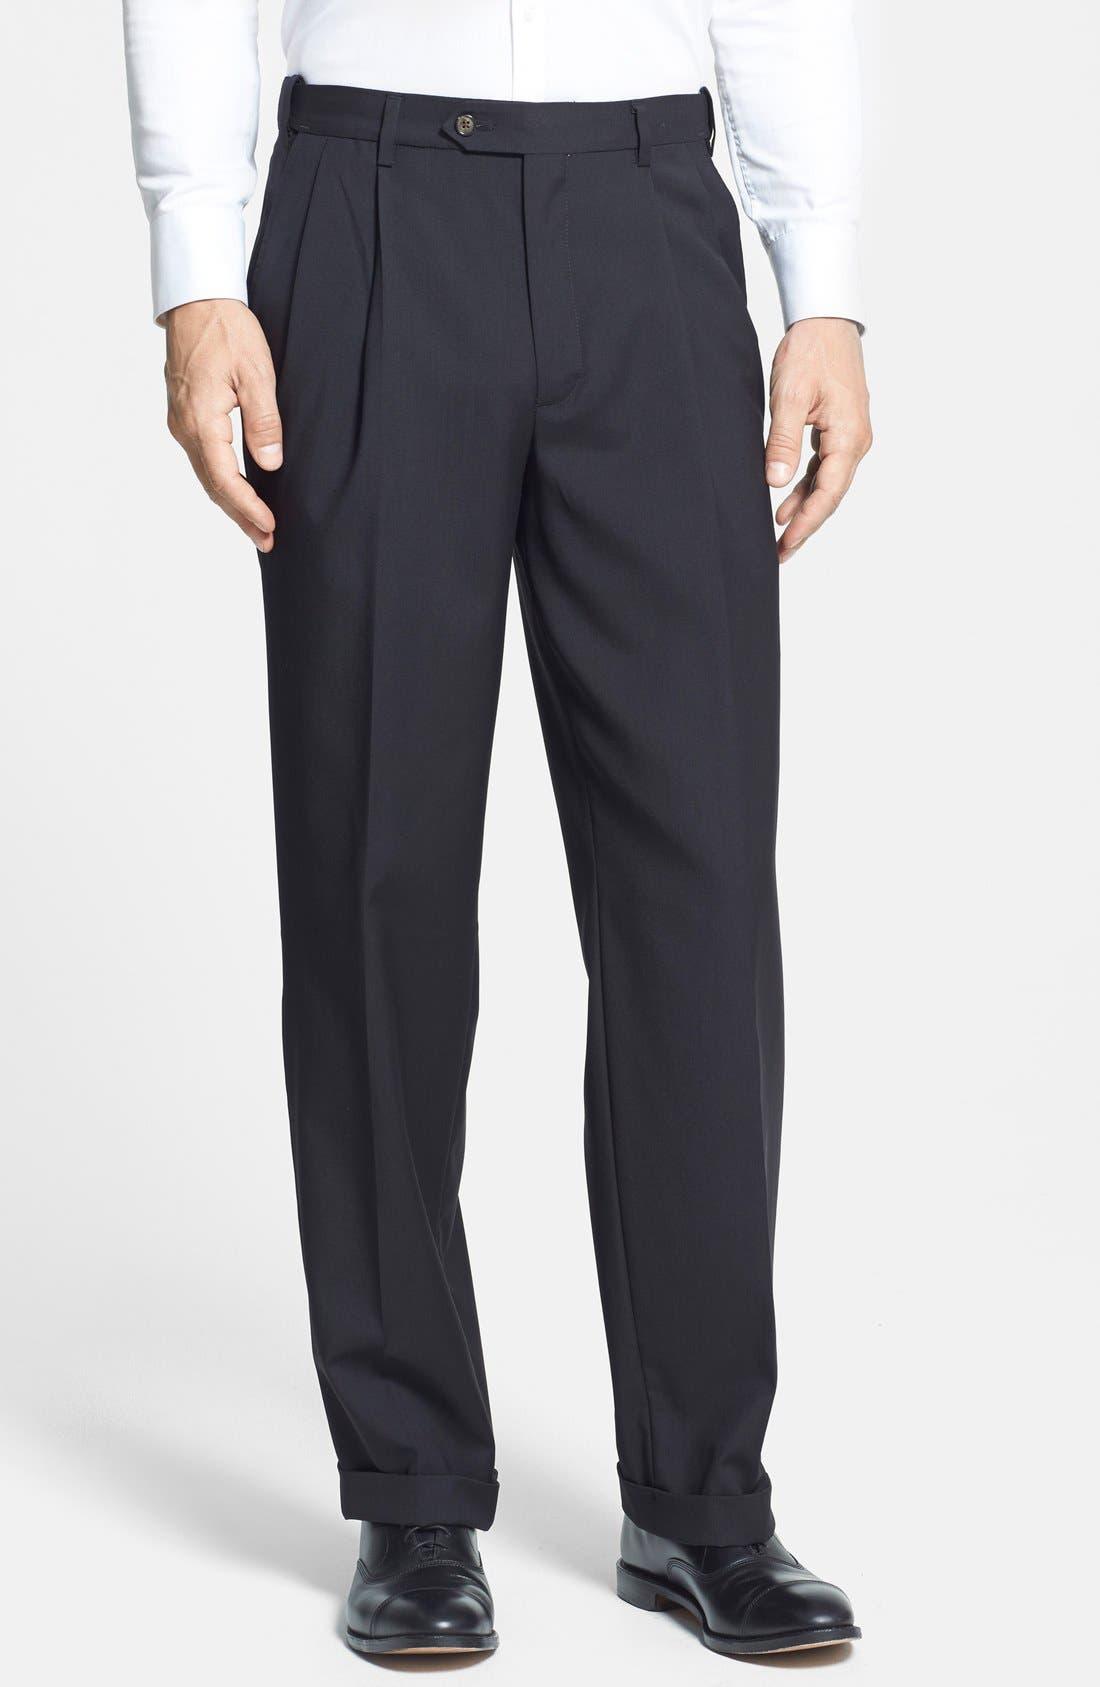 BERLE, Self Sizer Waist Pleated Trousers, Main thumbnail 1, color, BLACK